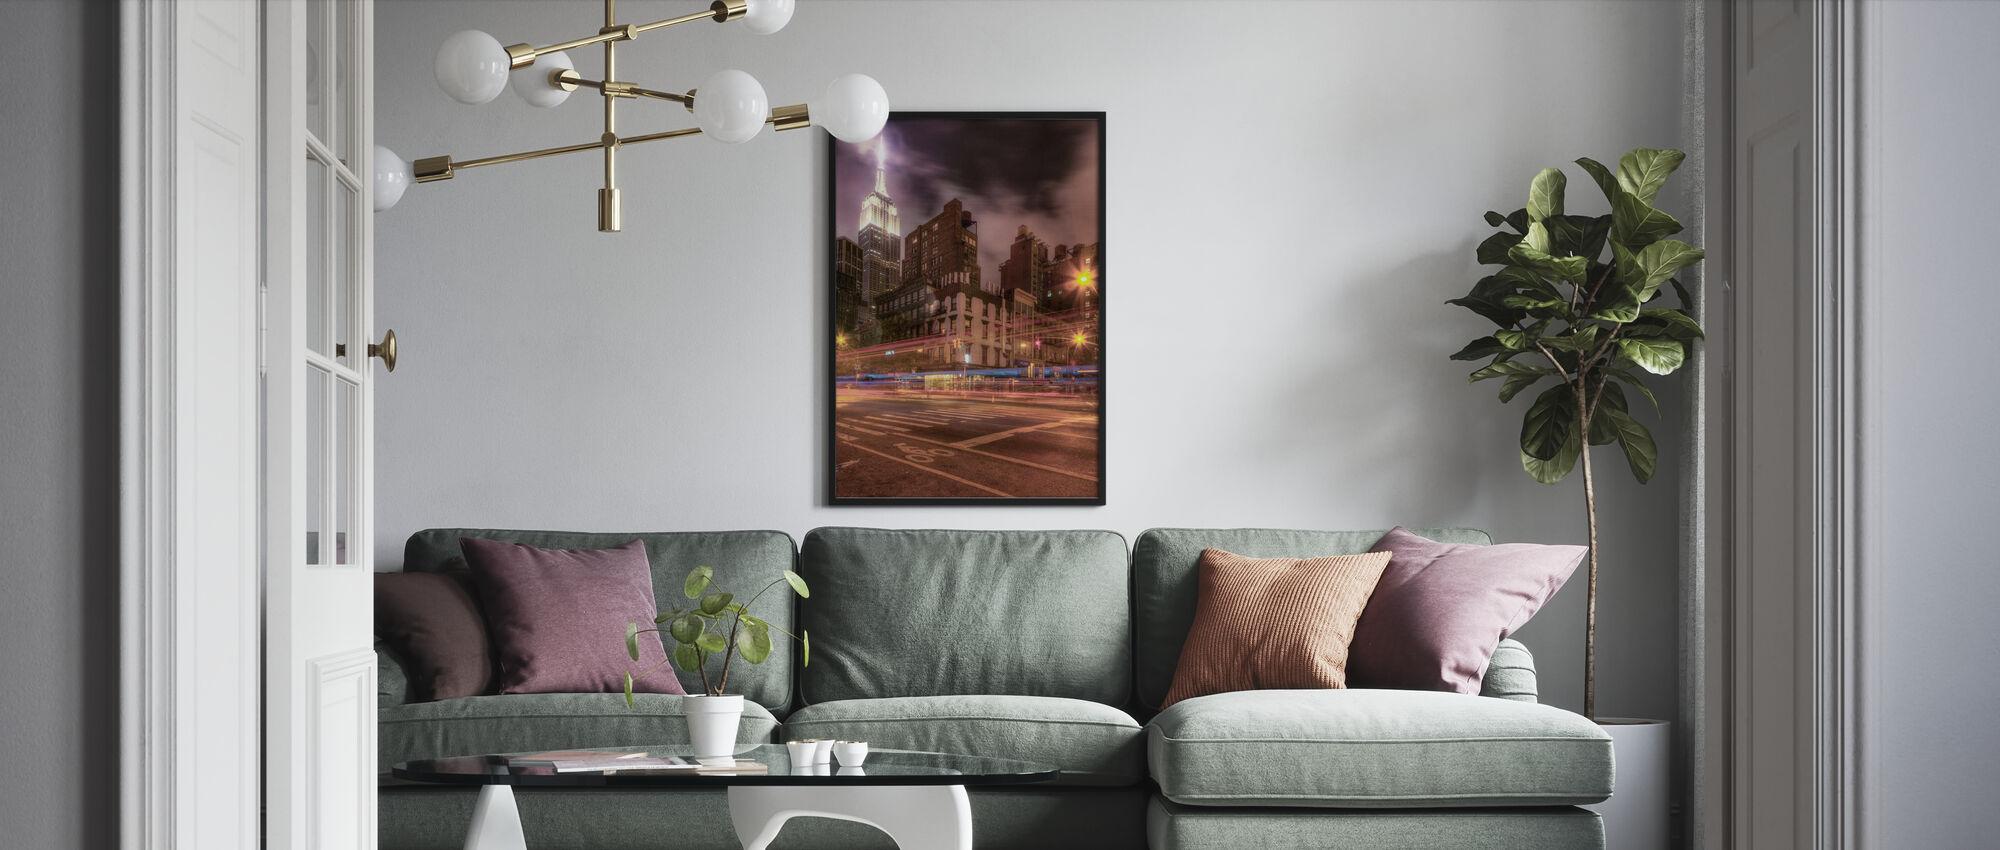 Gotham City - Poster - Living Room